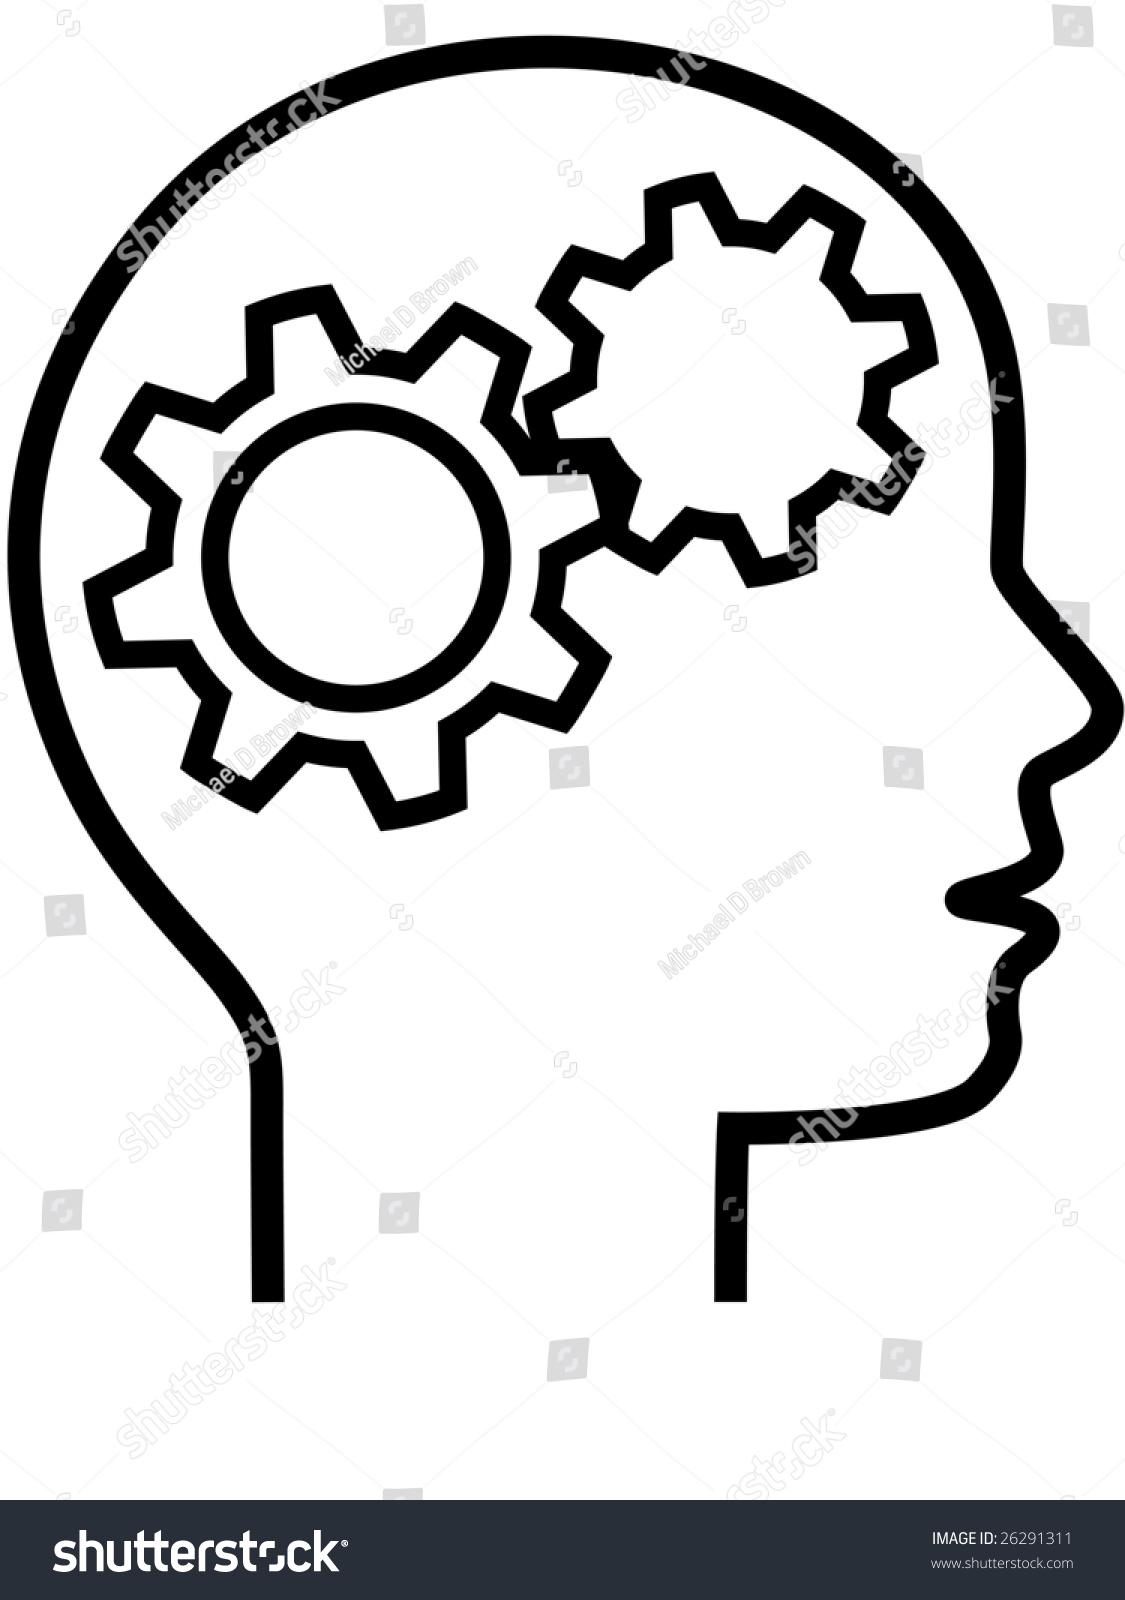 thinker inventor gear head brain 2 stock vector 26291311 shutterstock rh shutterstock com thinker clipart free thinker clipart